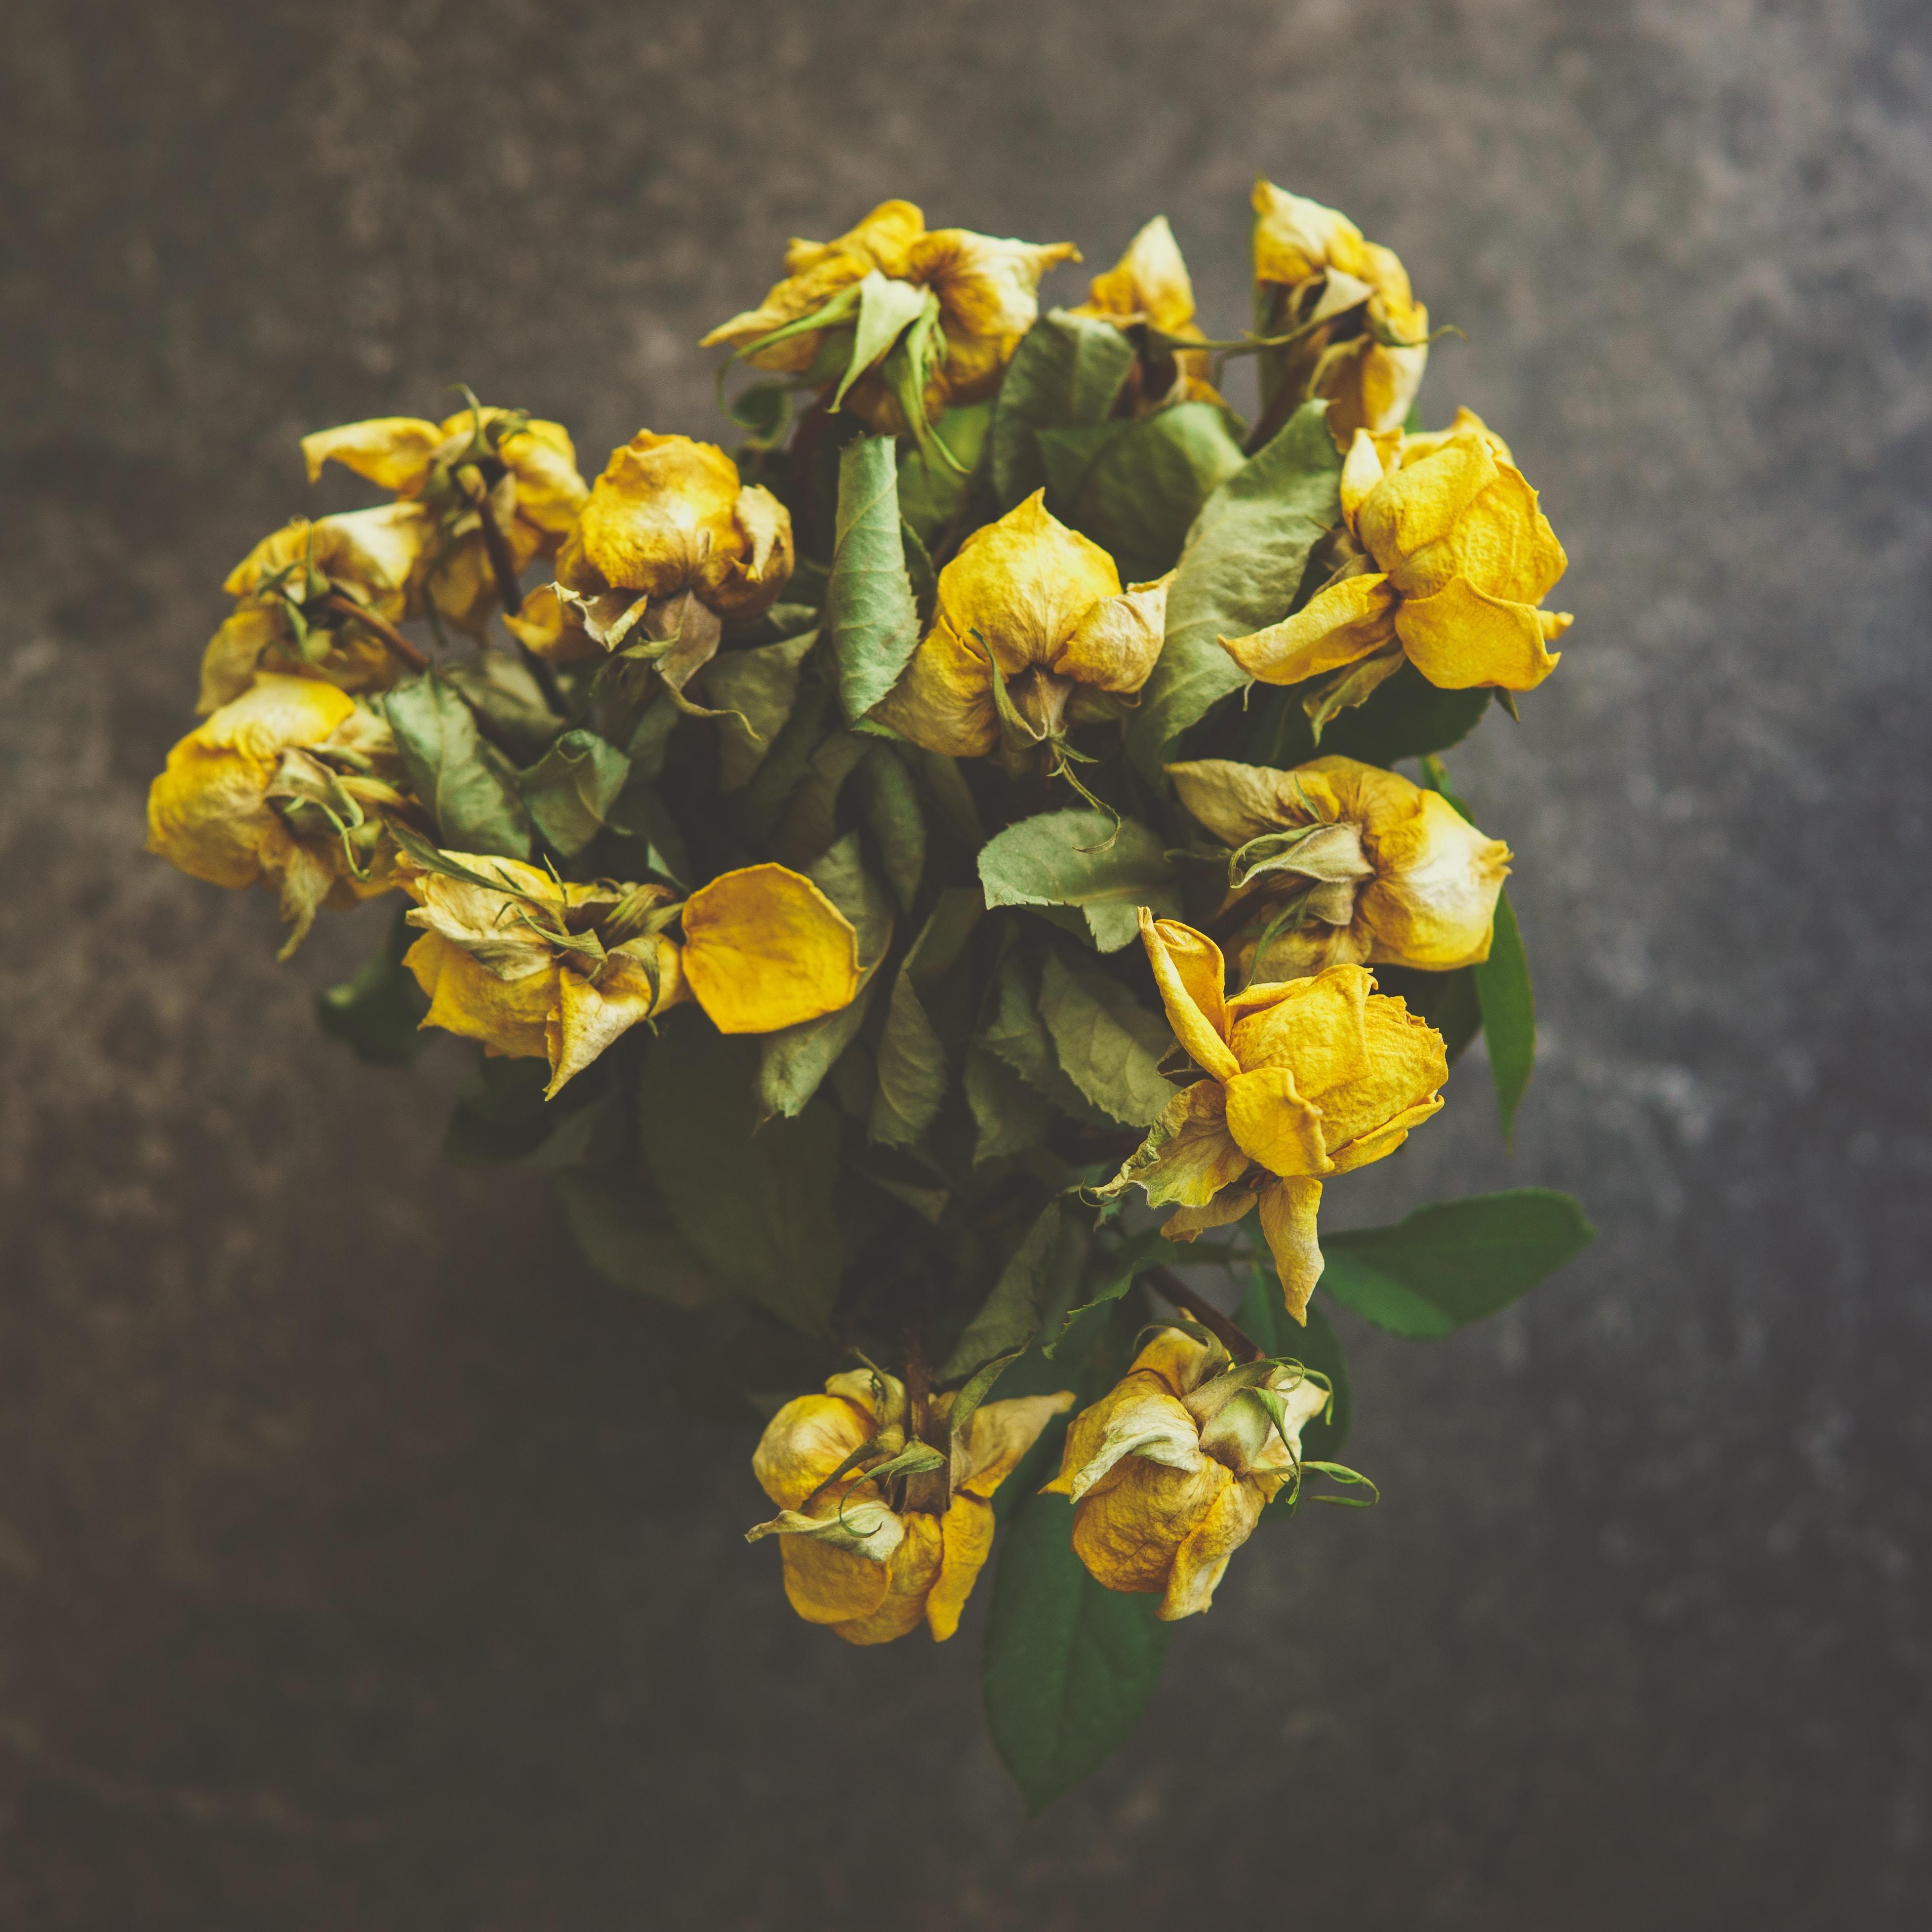 selective focus photography of yellow rose flower arrangement ]